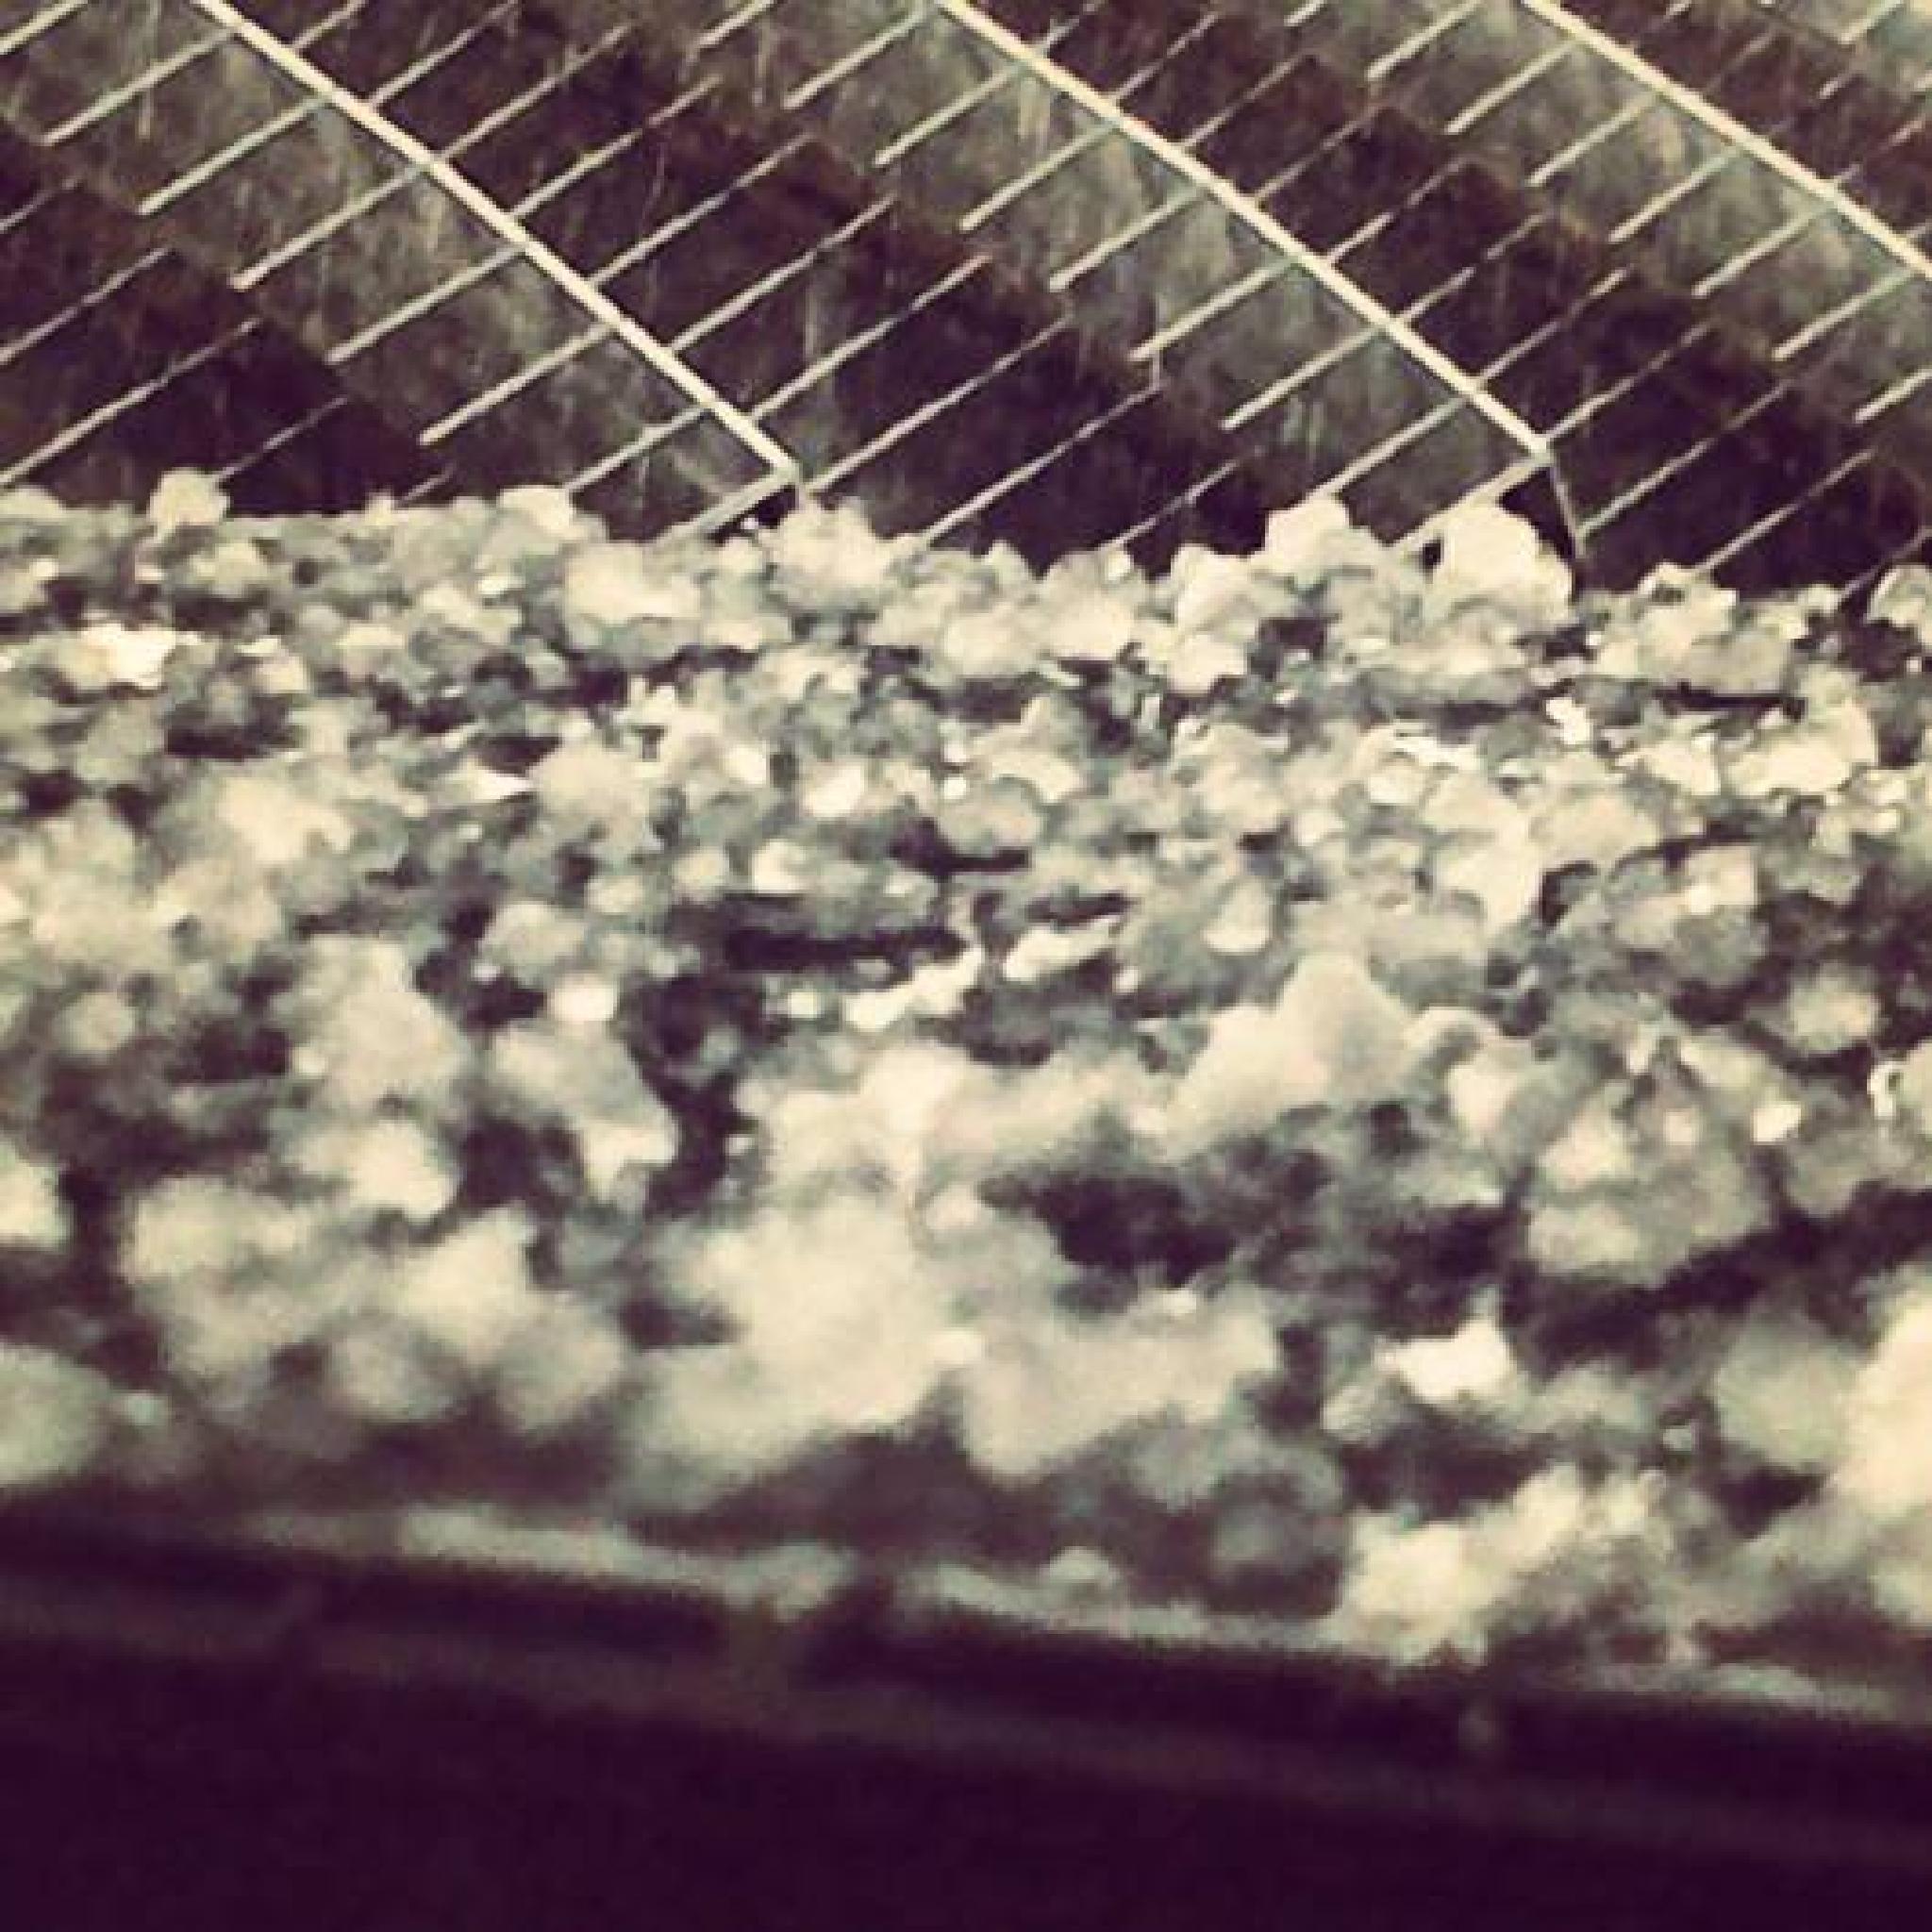 Hail rain by Natys